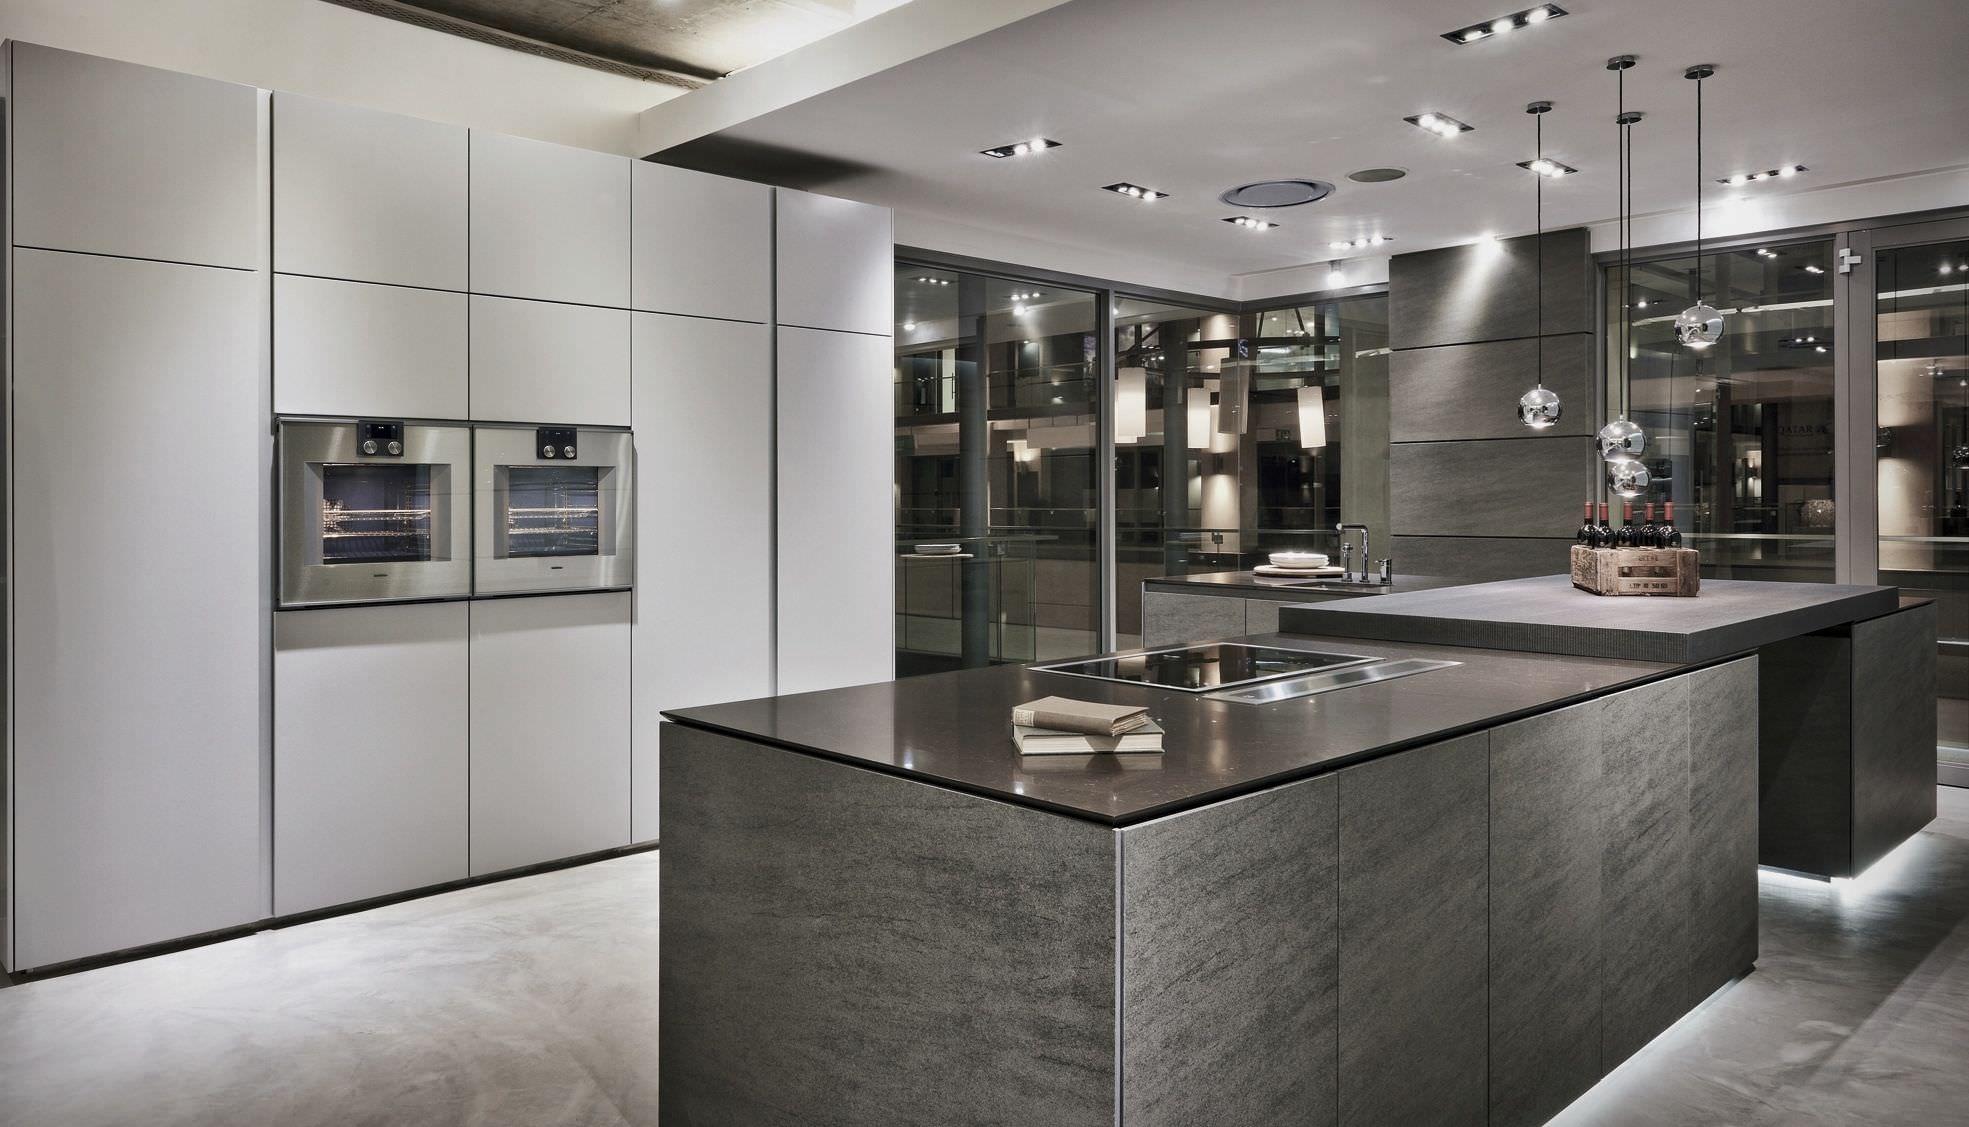 Peachy Luxury Kitchen Showroom Project Grey Luxury Kitchen Interior Design Ideas Tzicisoteloinfo